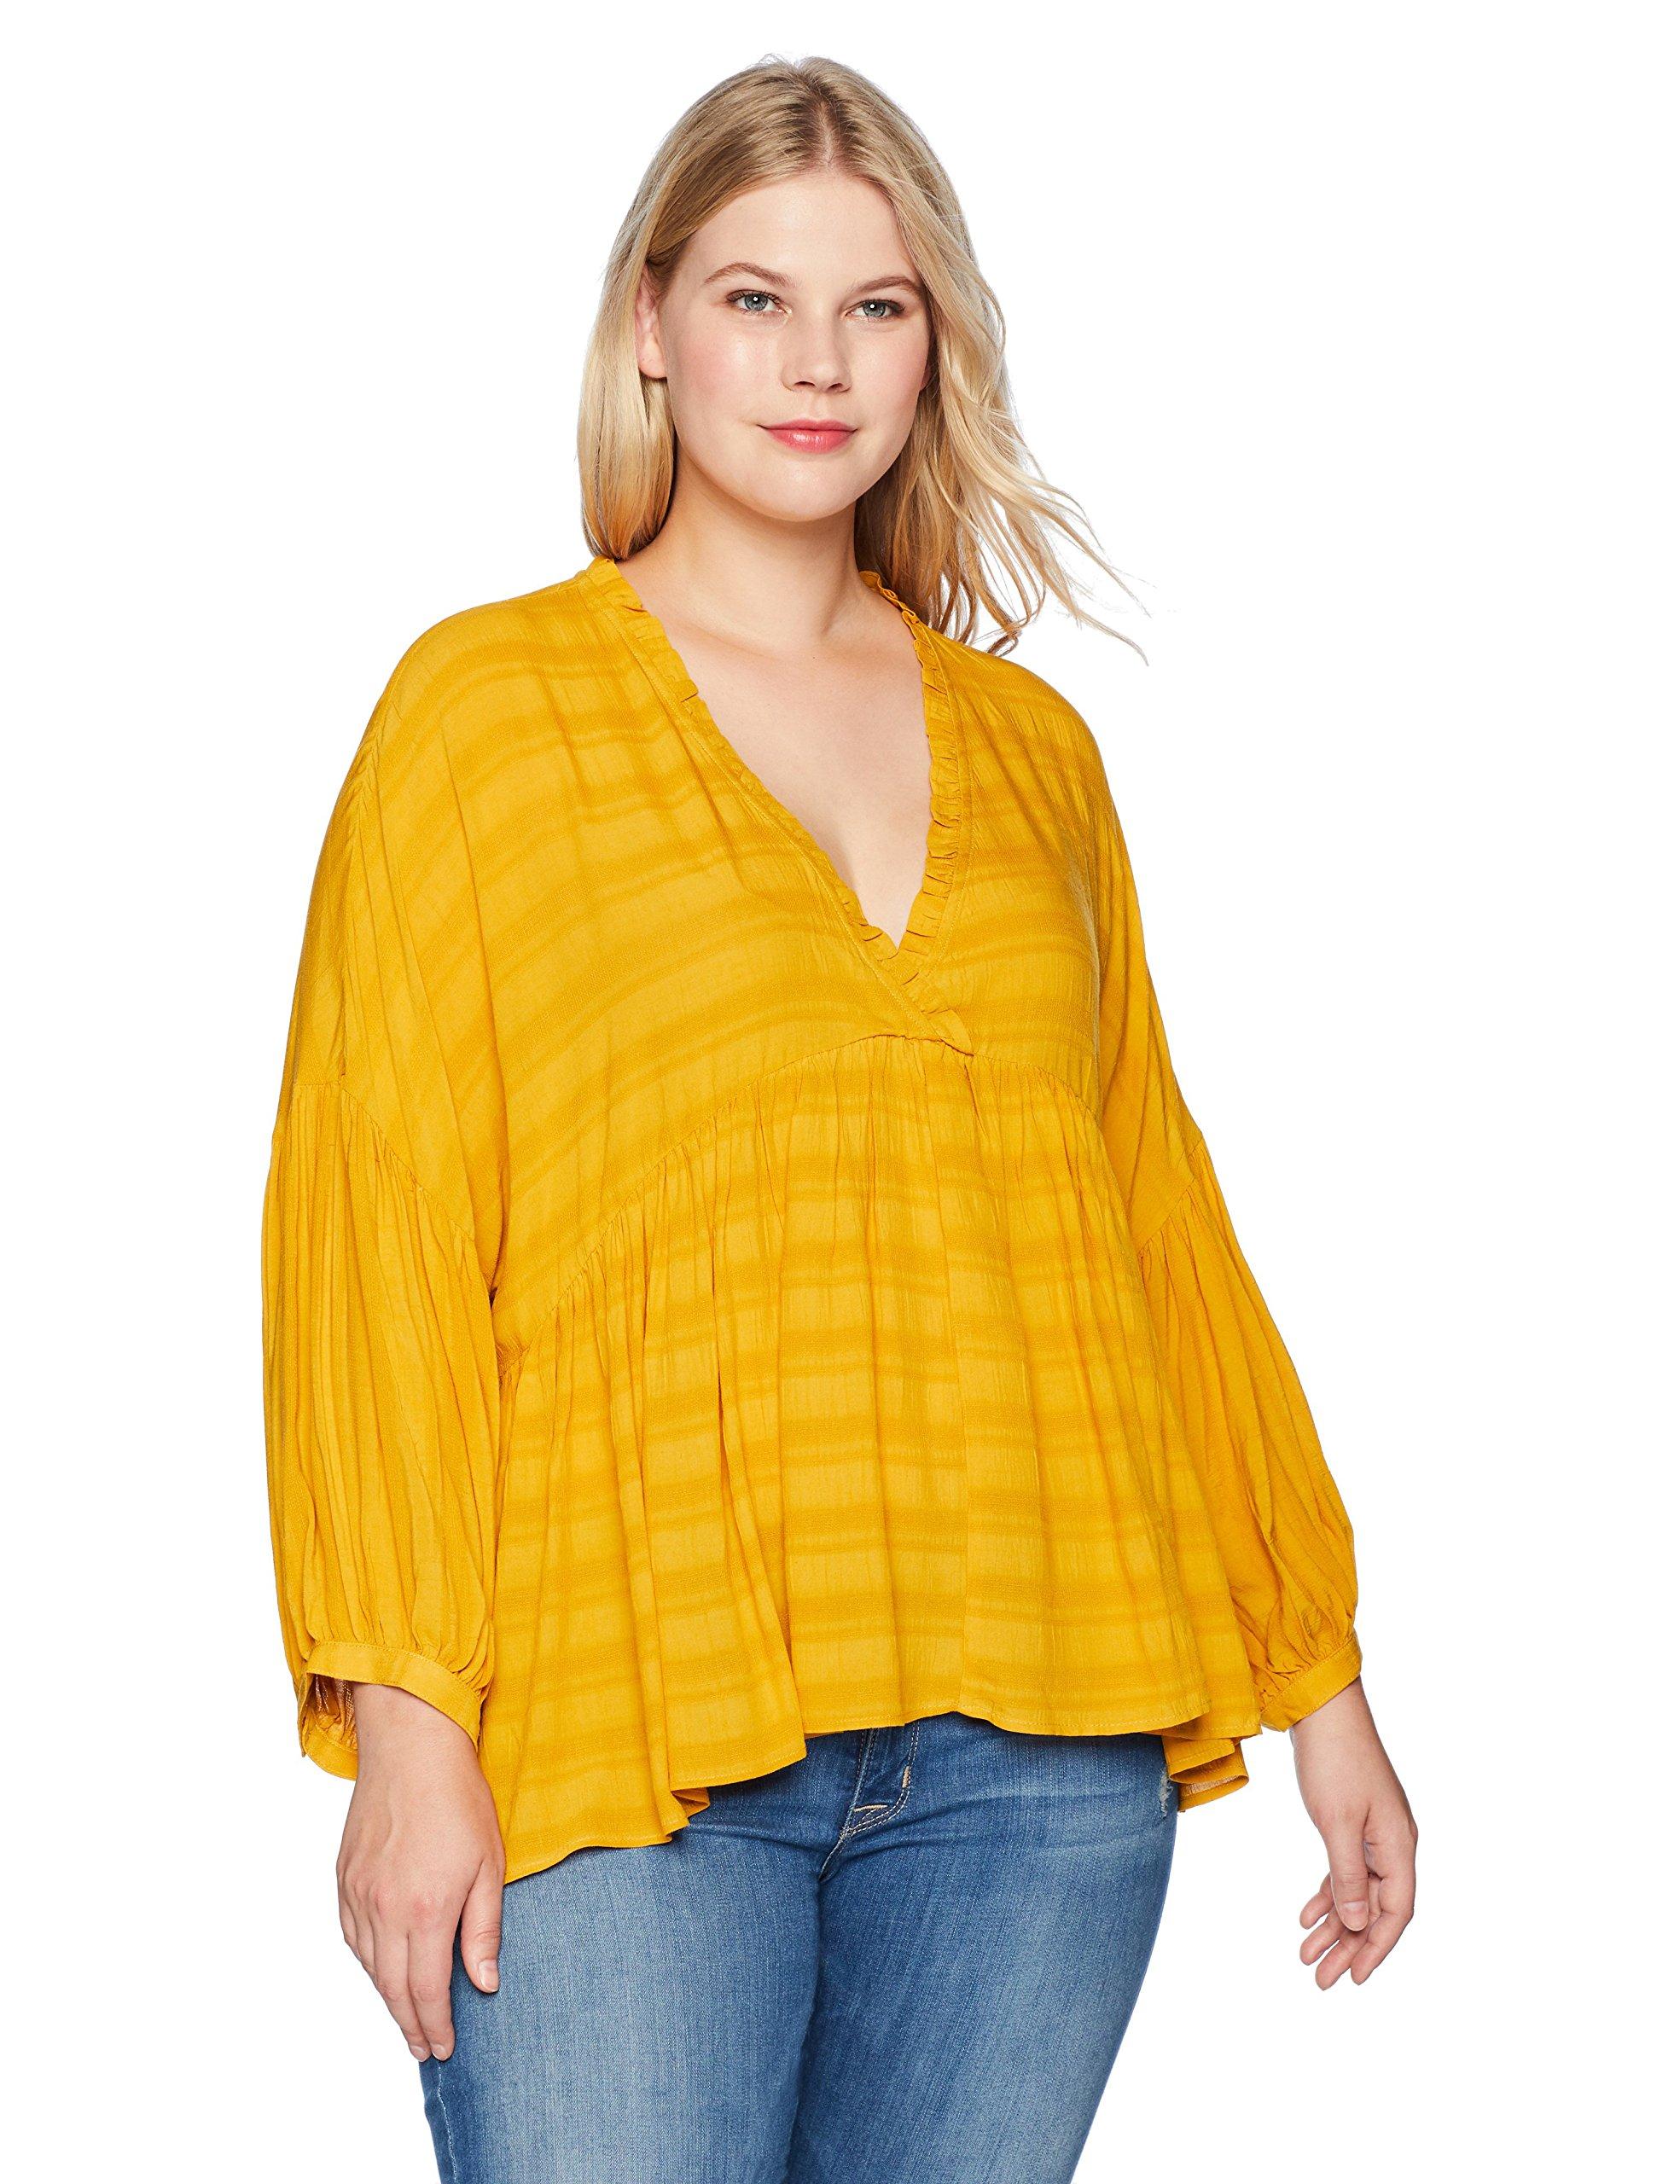 Lucky Brand Women's Plus Size Romantic Peasant Ruffle Top, Golden Spice, 1X